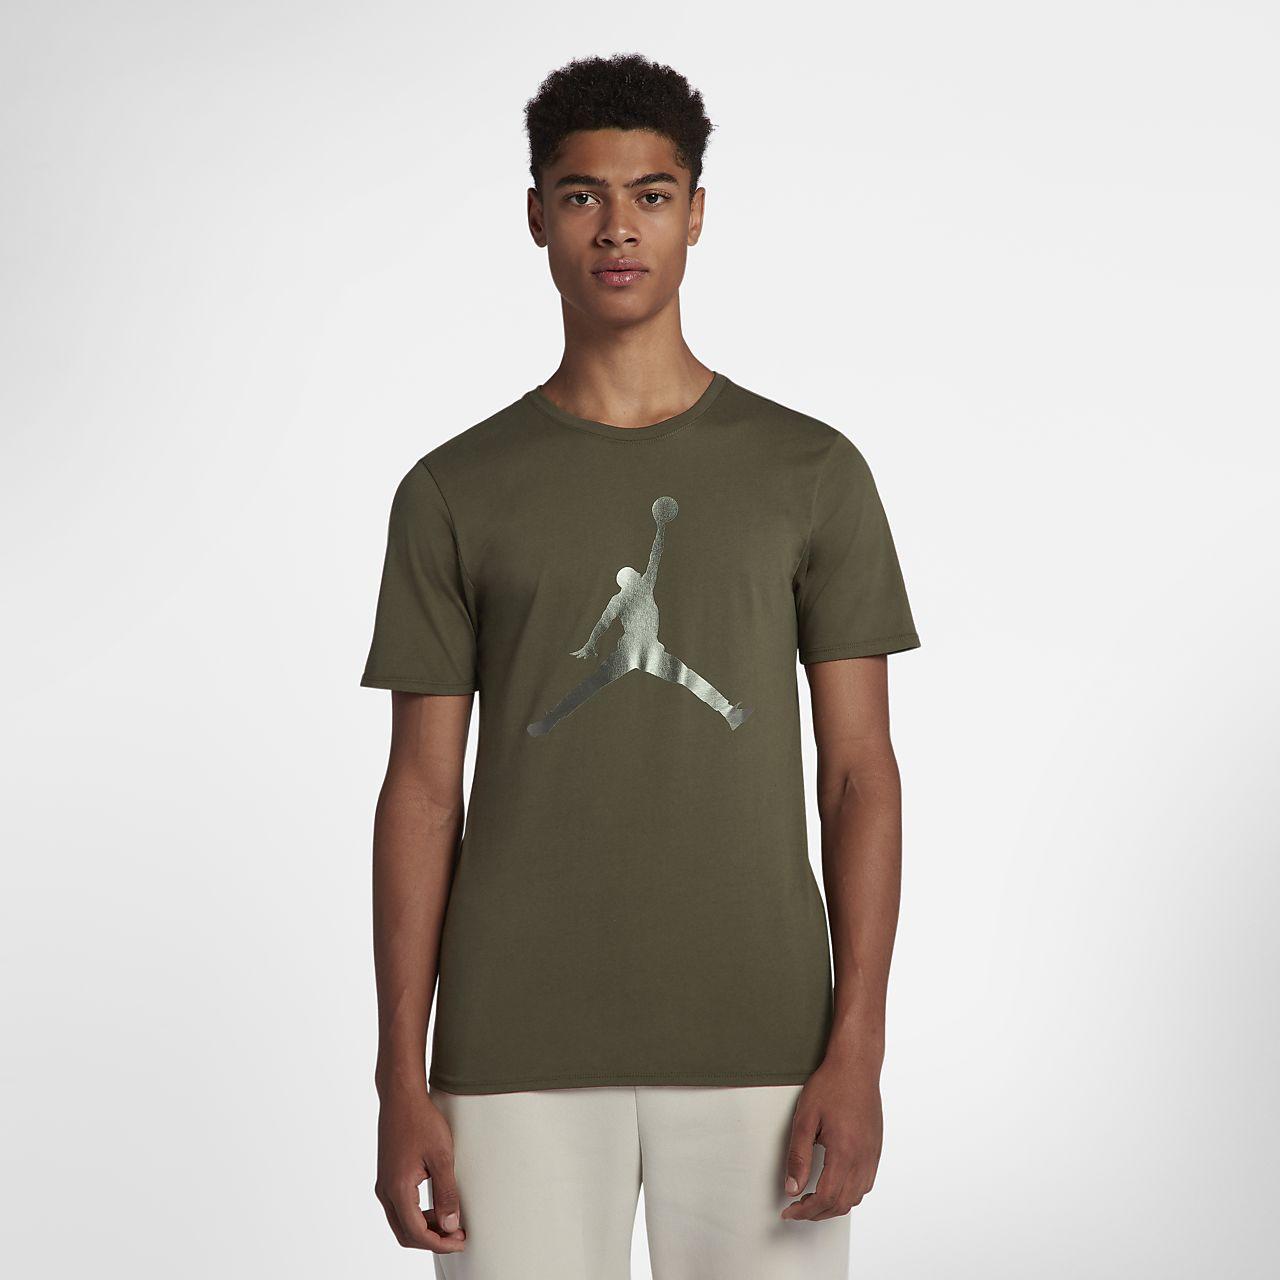 Sportswear Jordan Jumpman Iconic Es Camiseta Hombre RwF1qwU